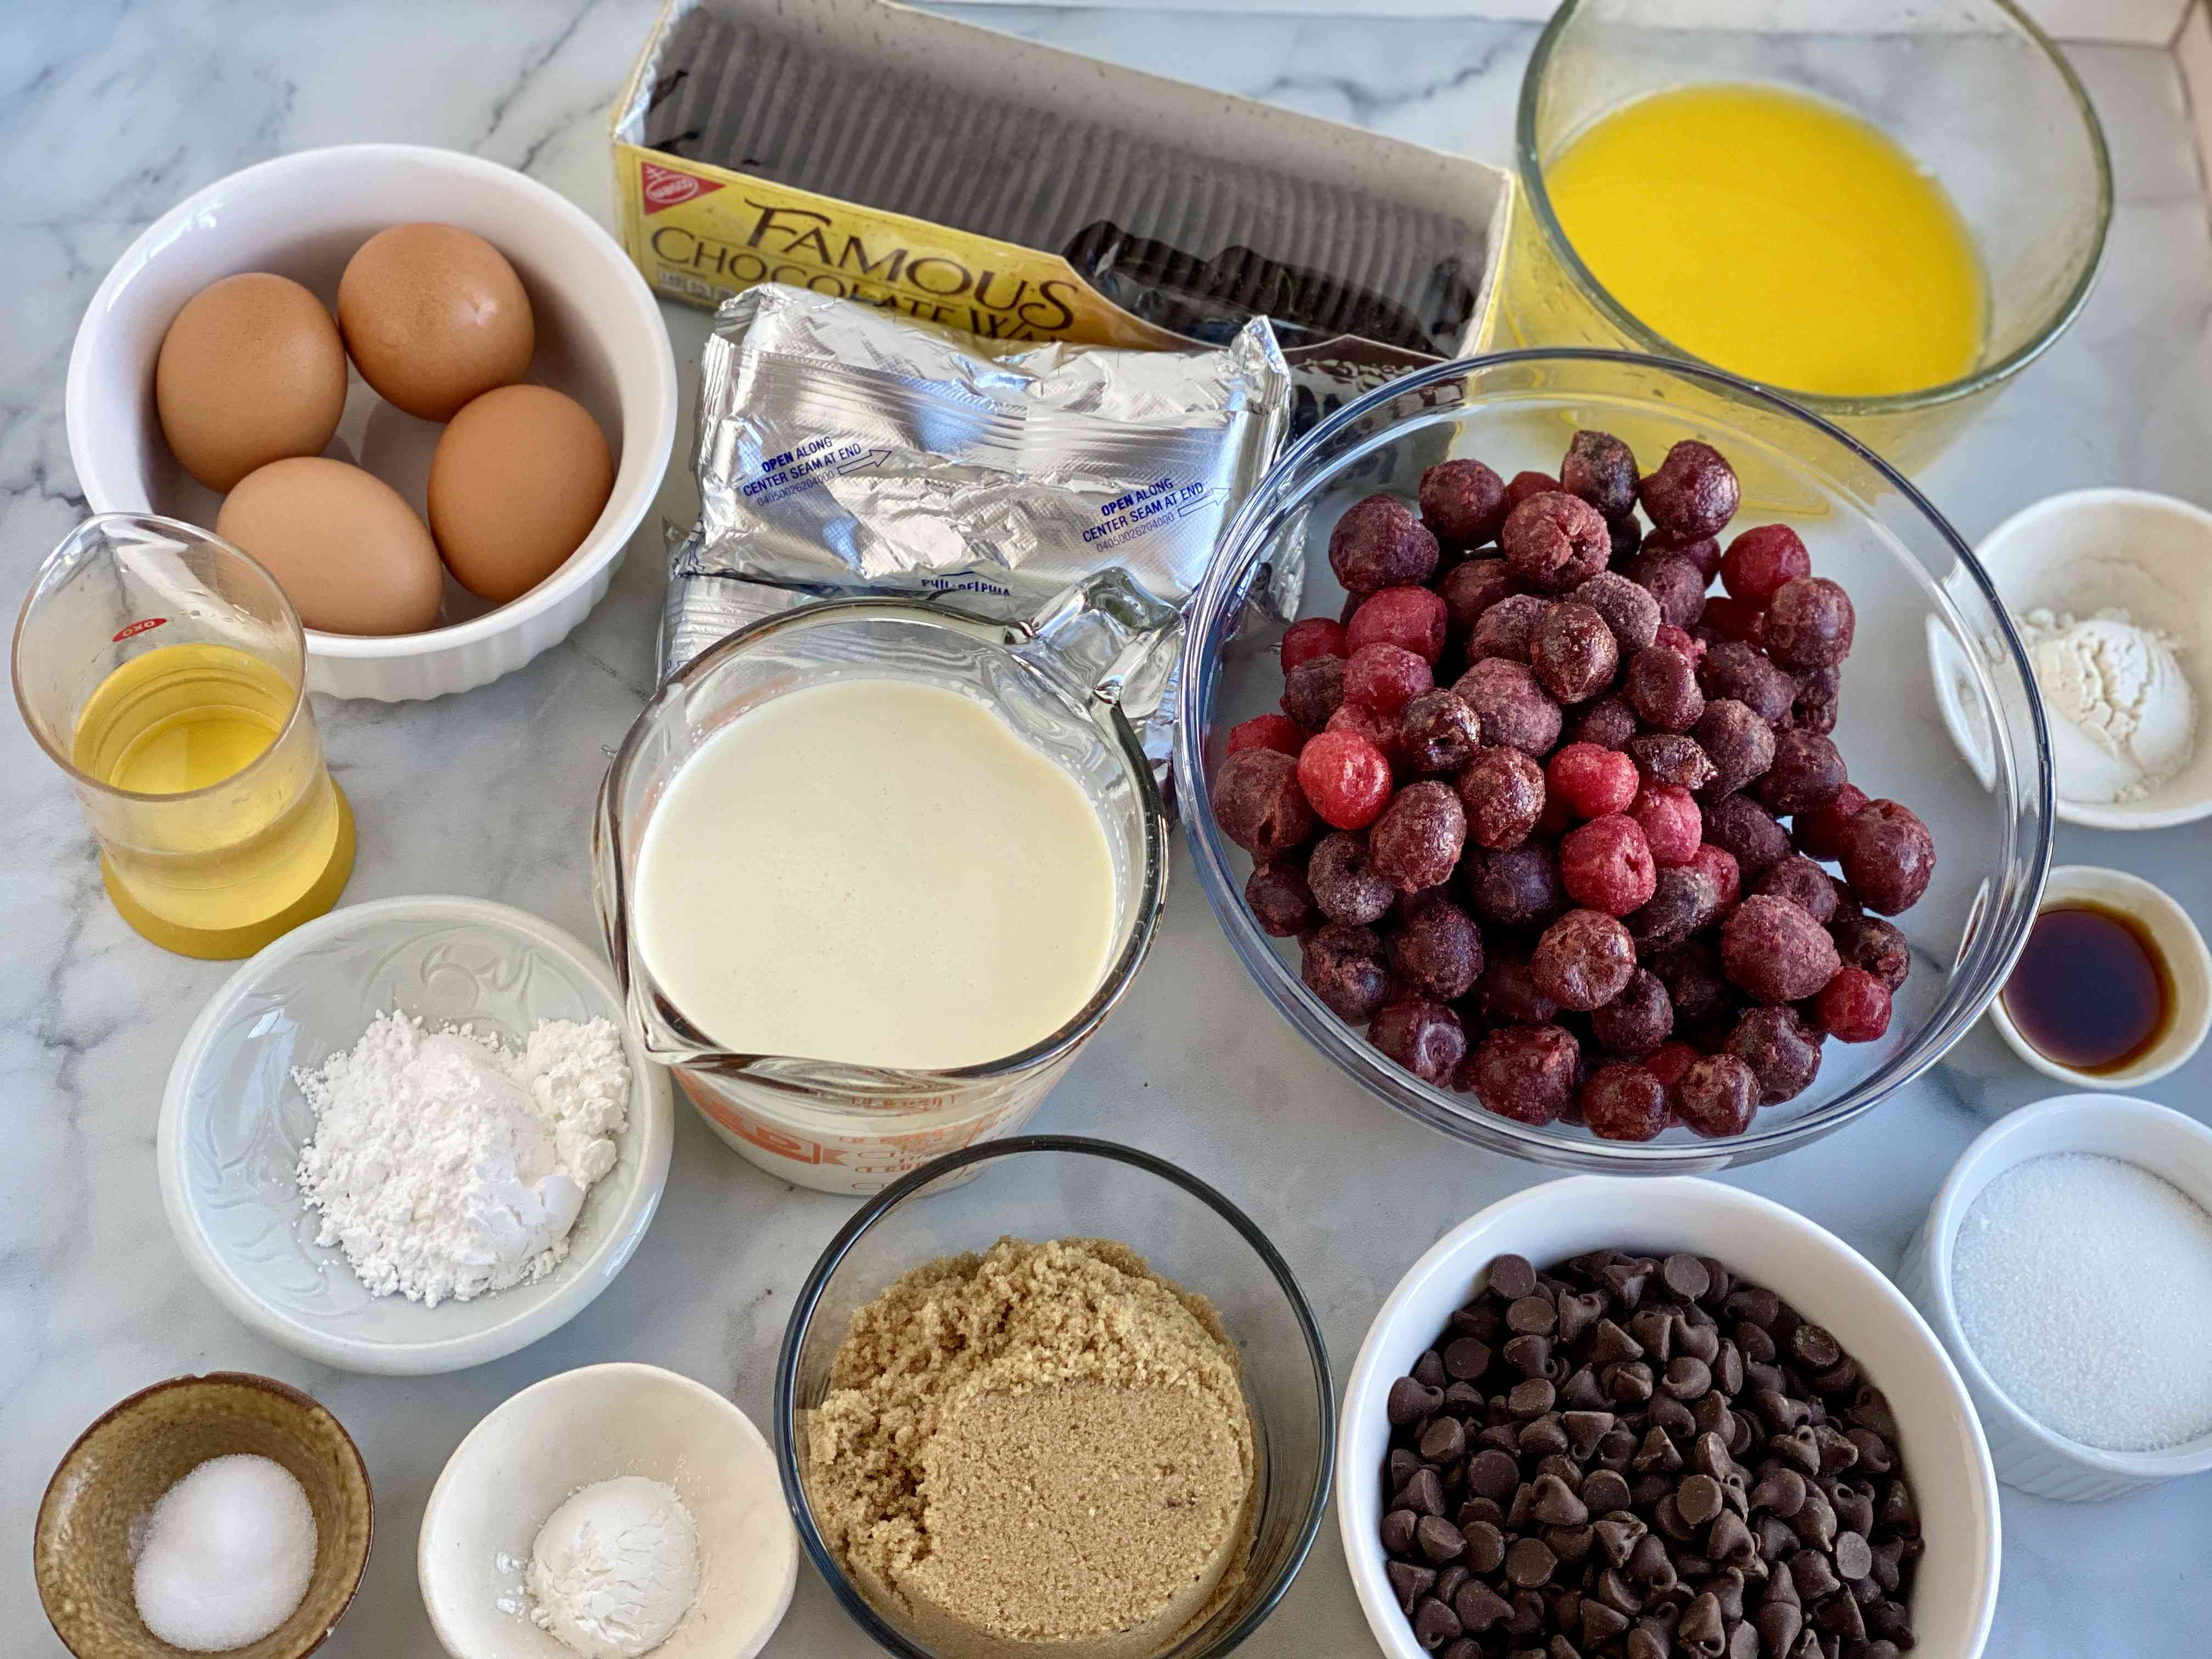 Black Forest Cheesecake Ingredients